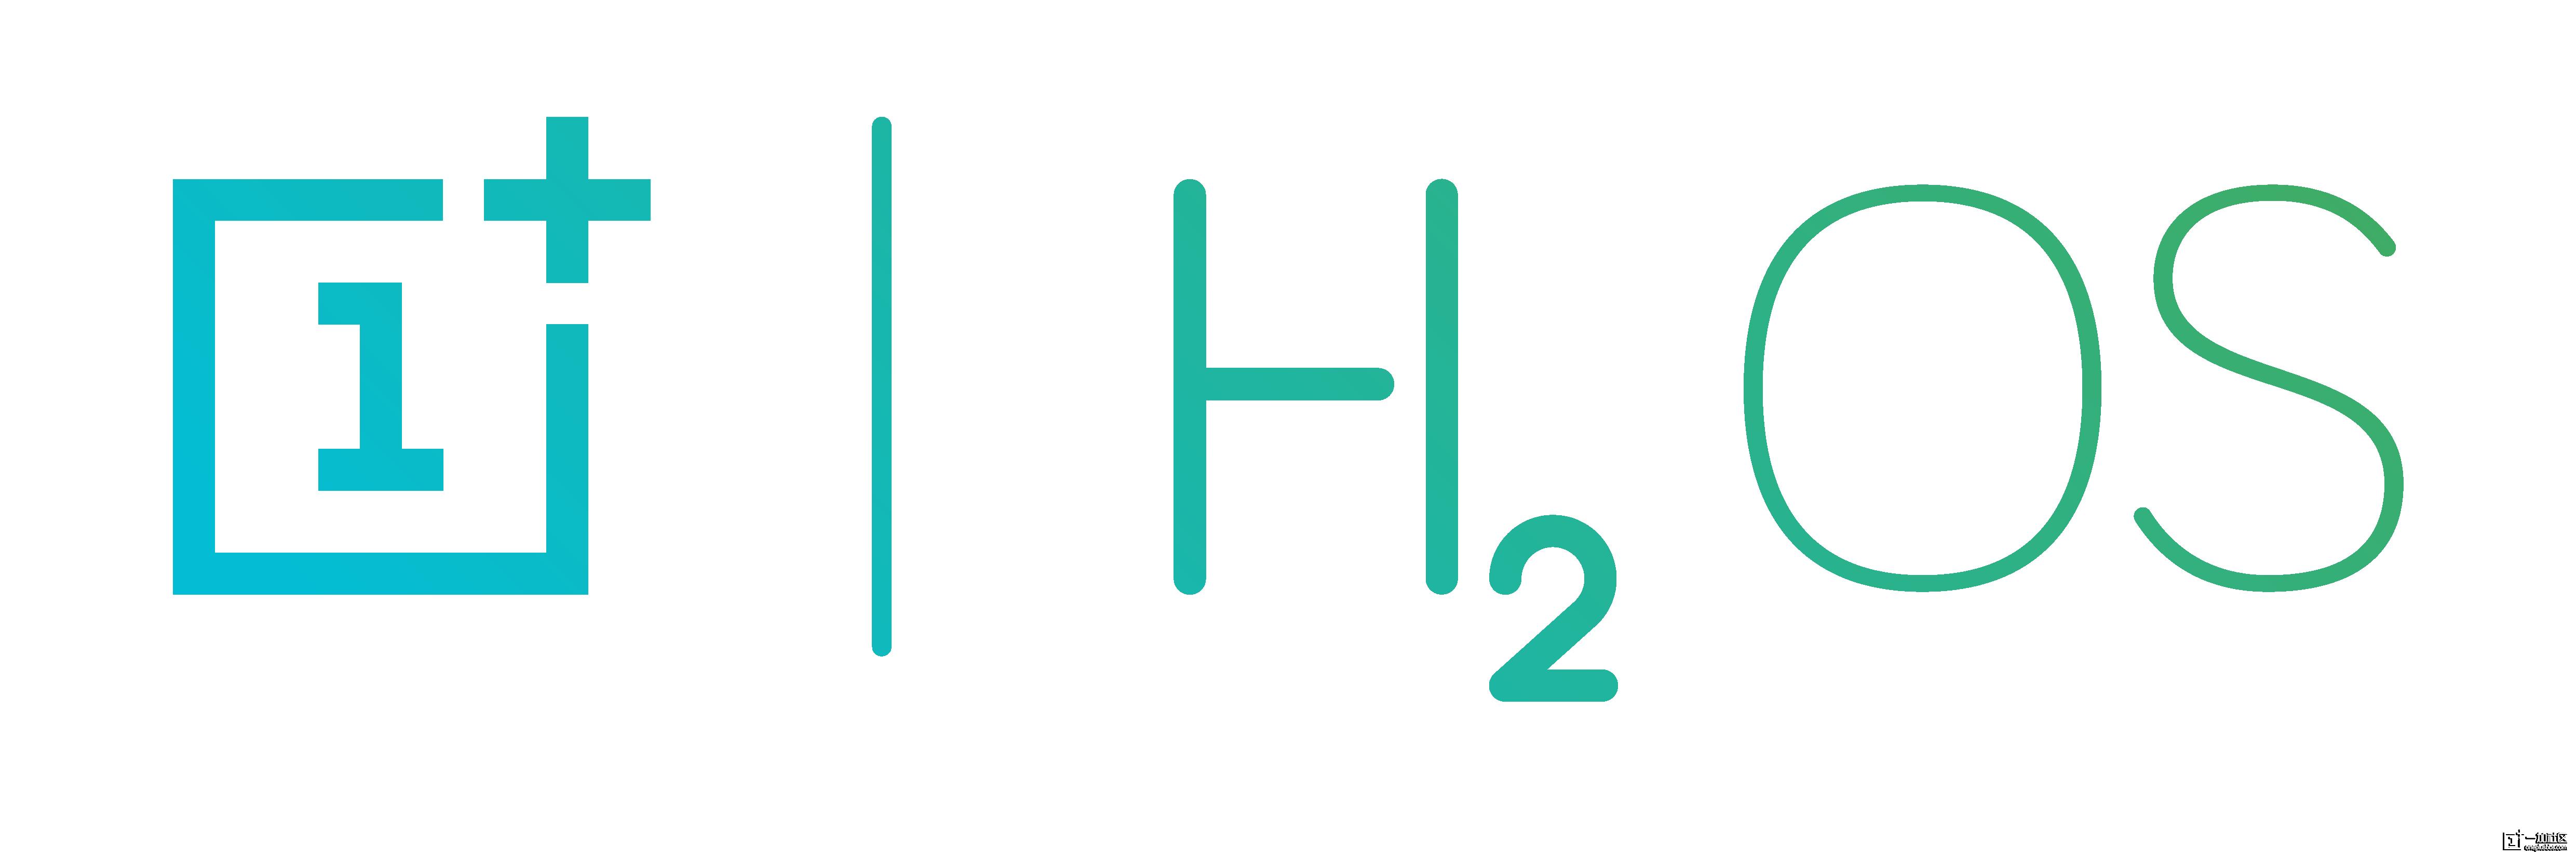 1 H2_Screen_Gradients-02.png